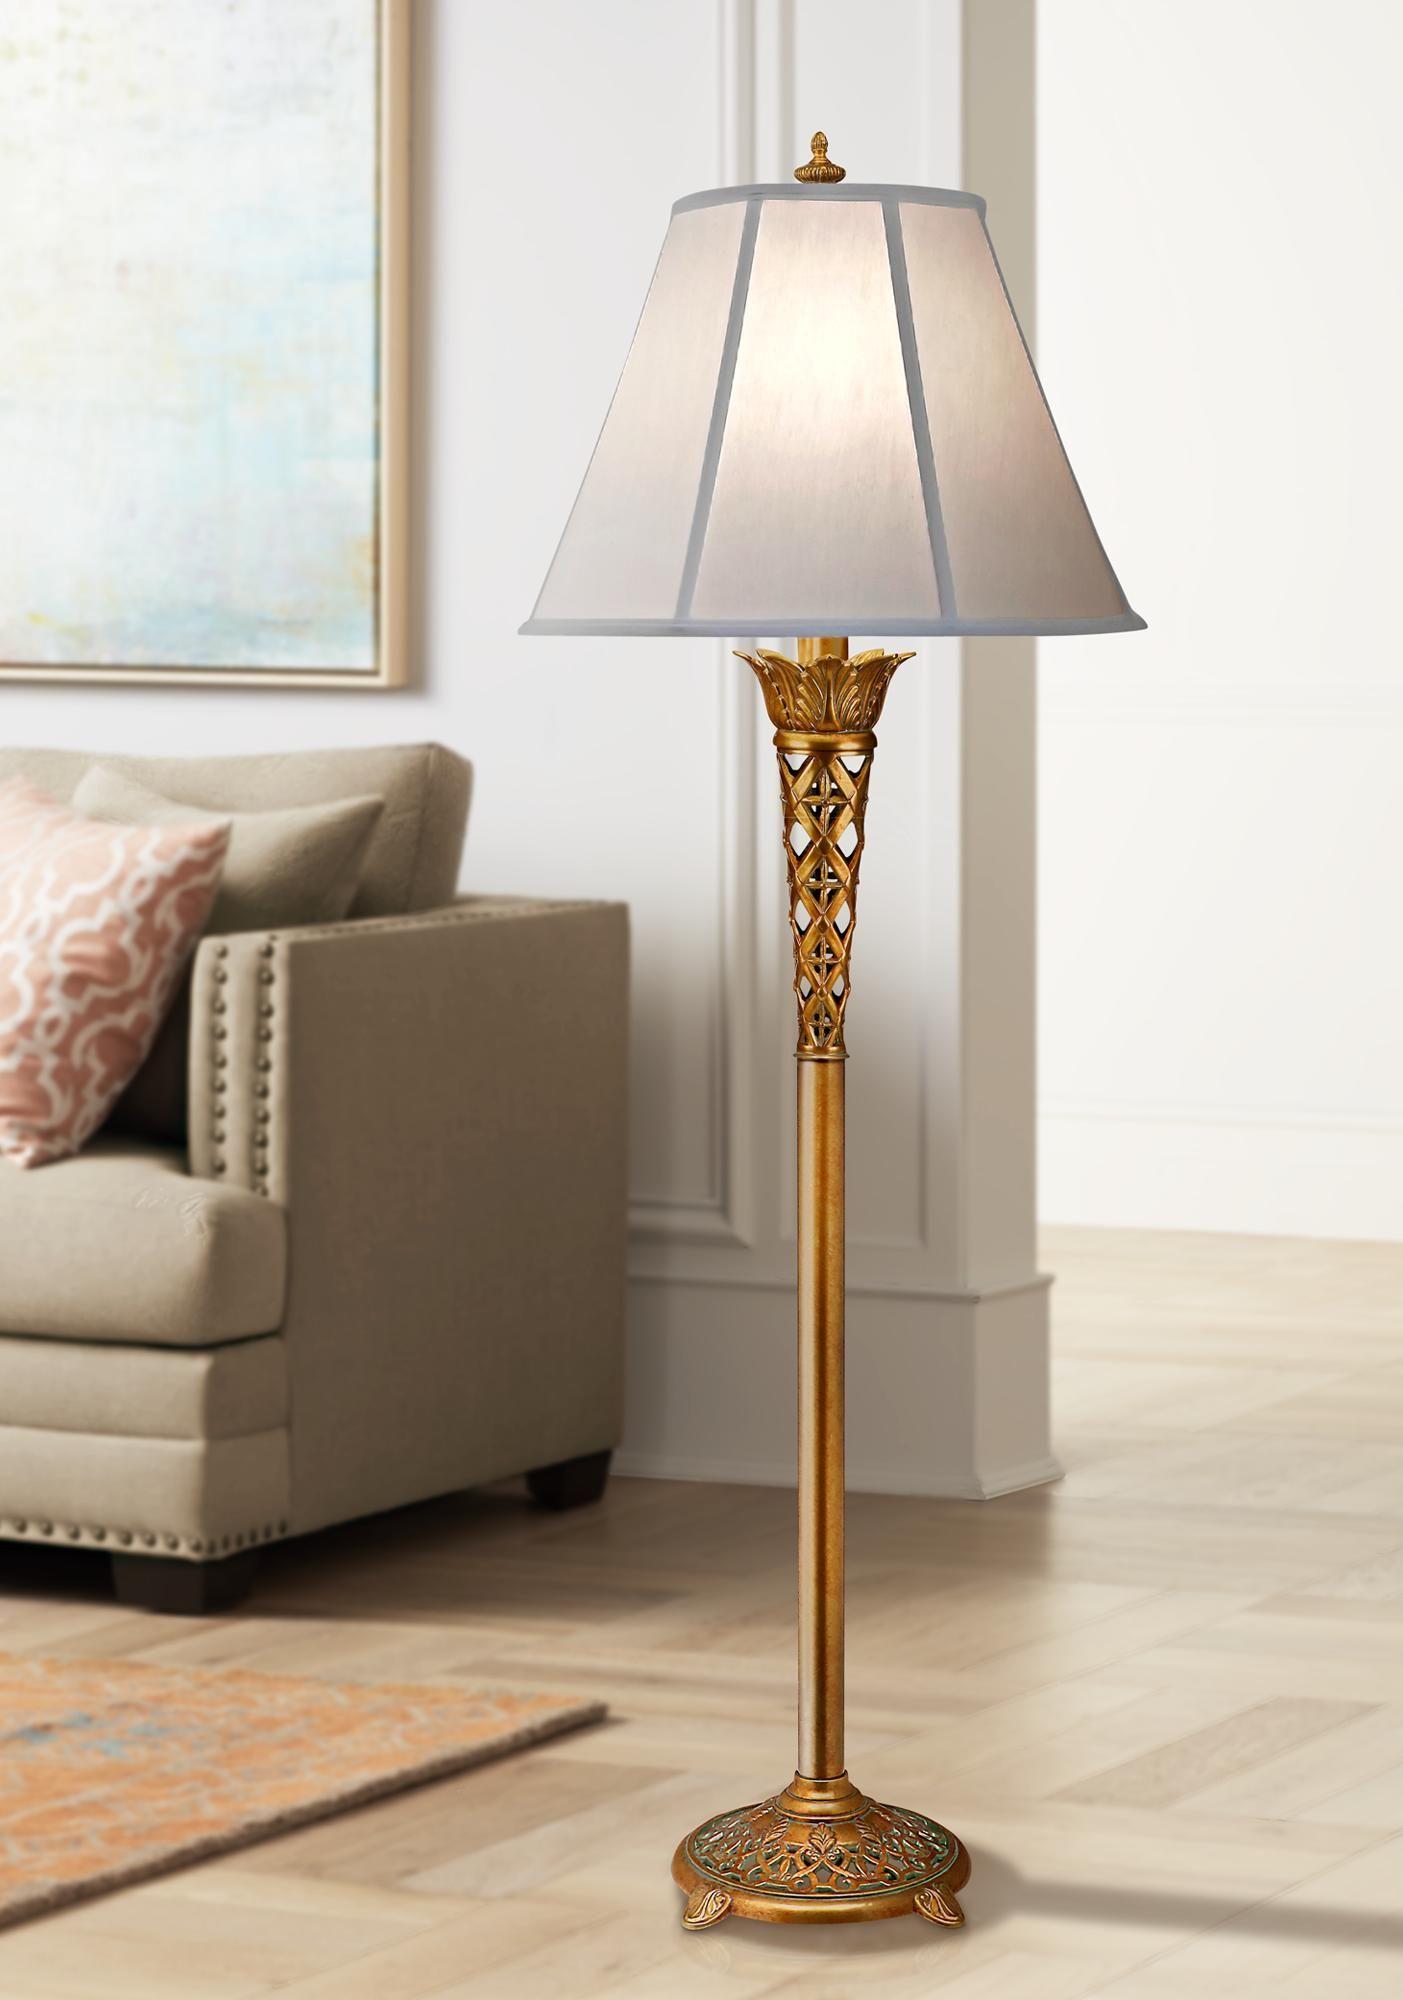 Floor Lamps Stiffel Mcdermott French Gold Floor Lamp In 2020 Gold Floor Lamp Lamp Floor Lamp